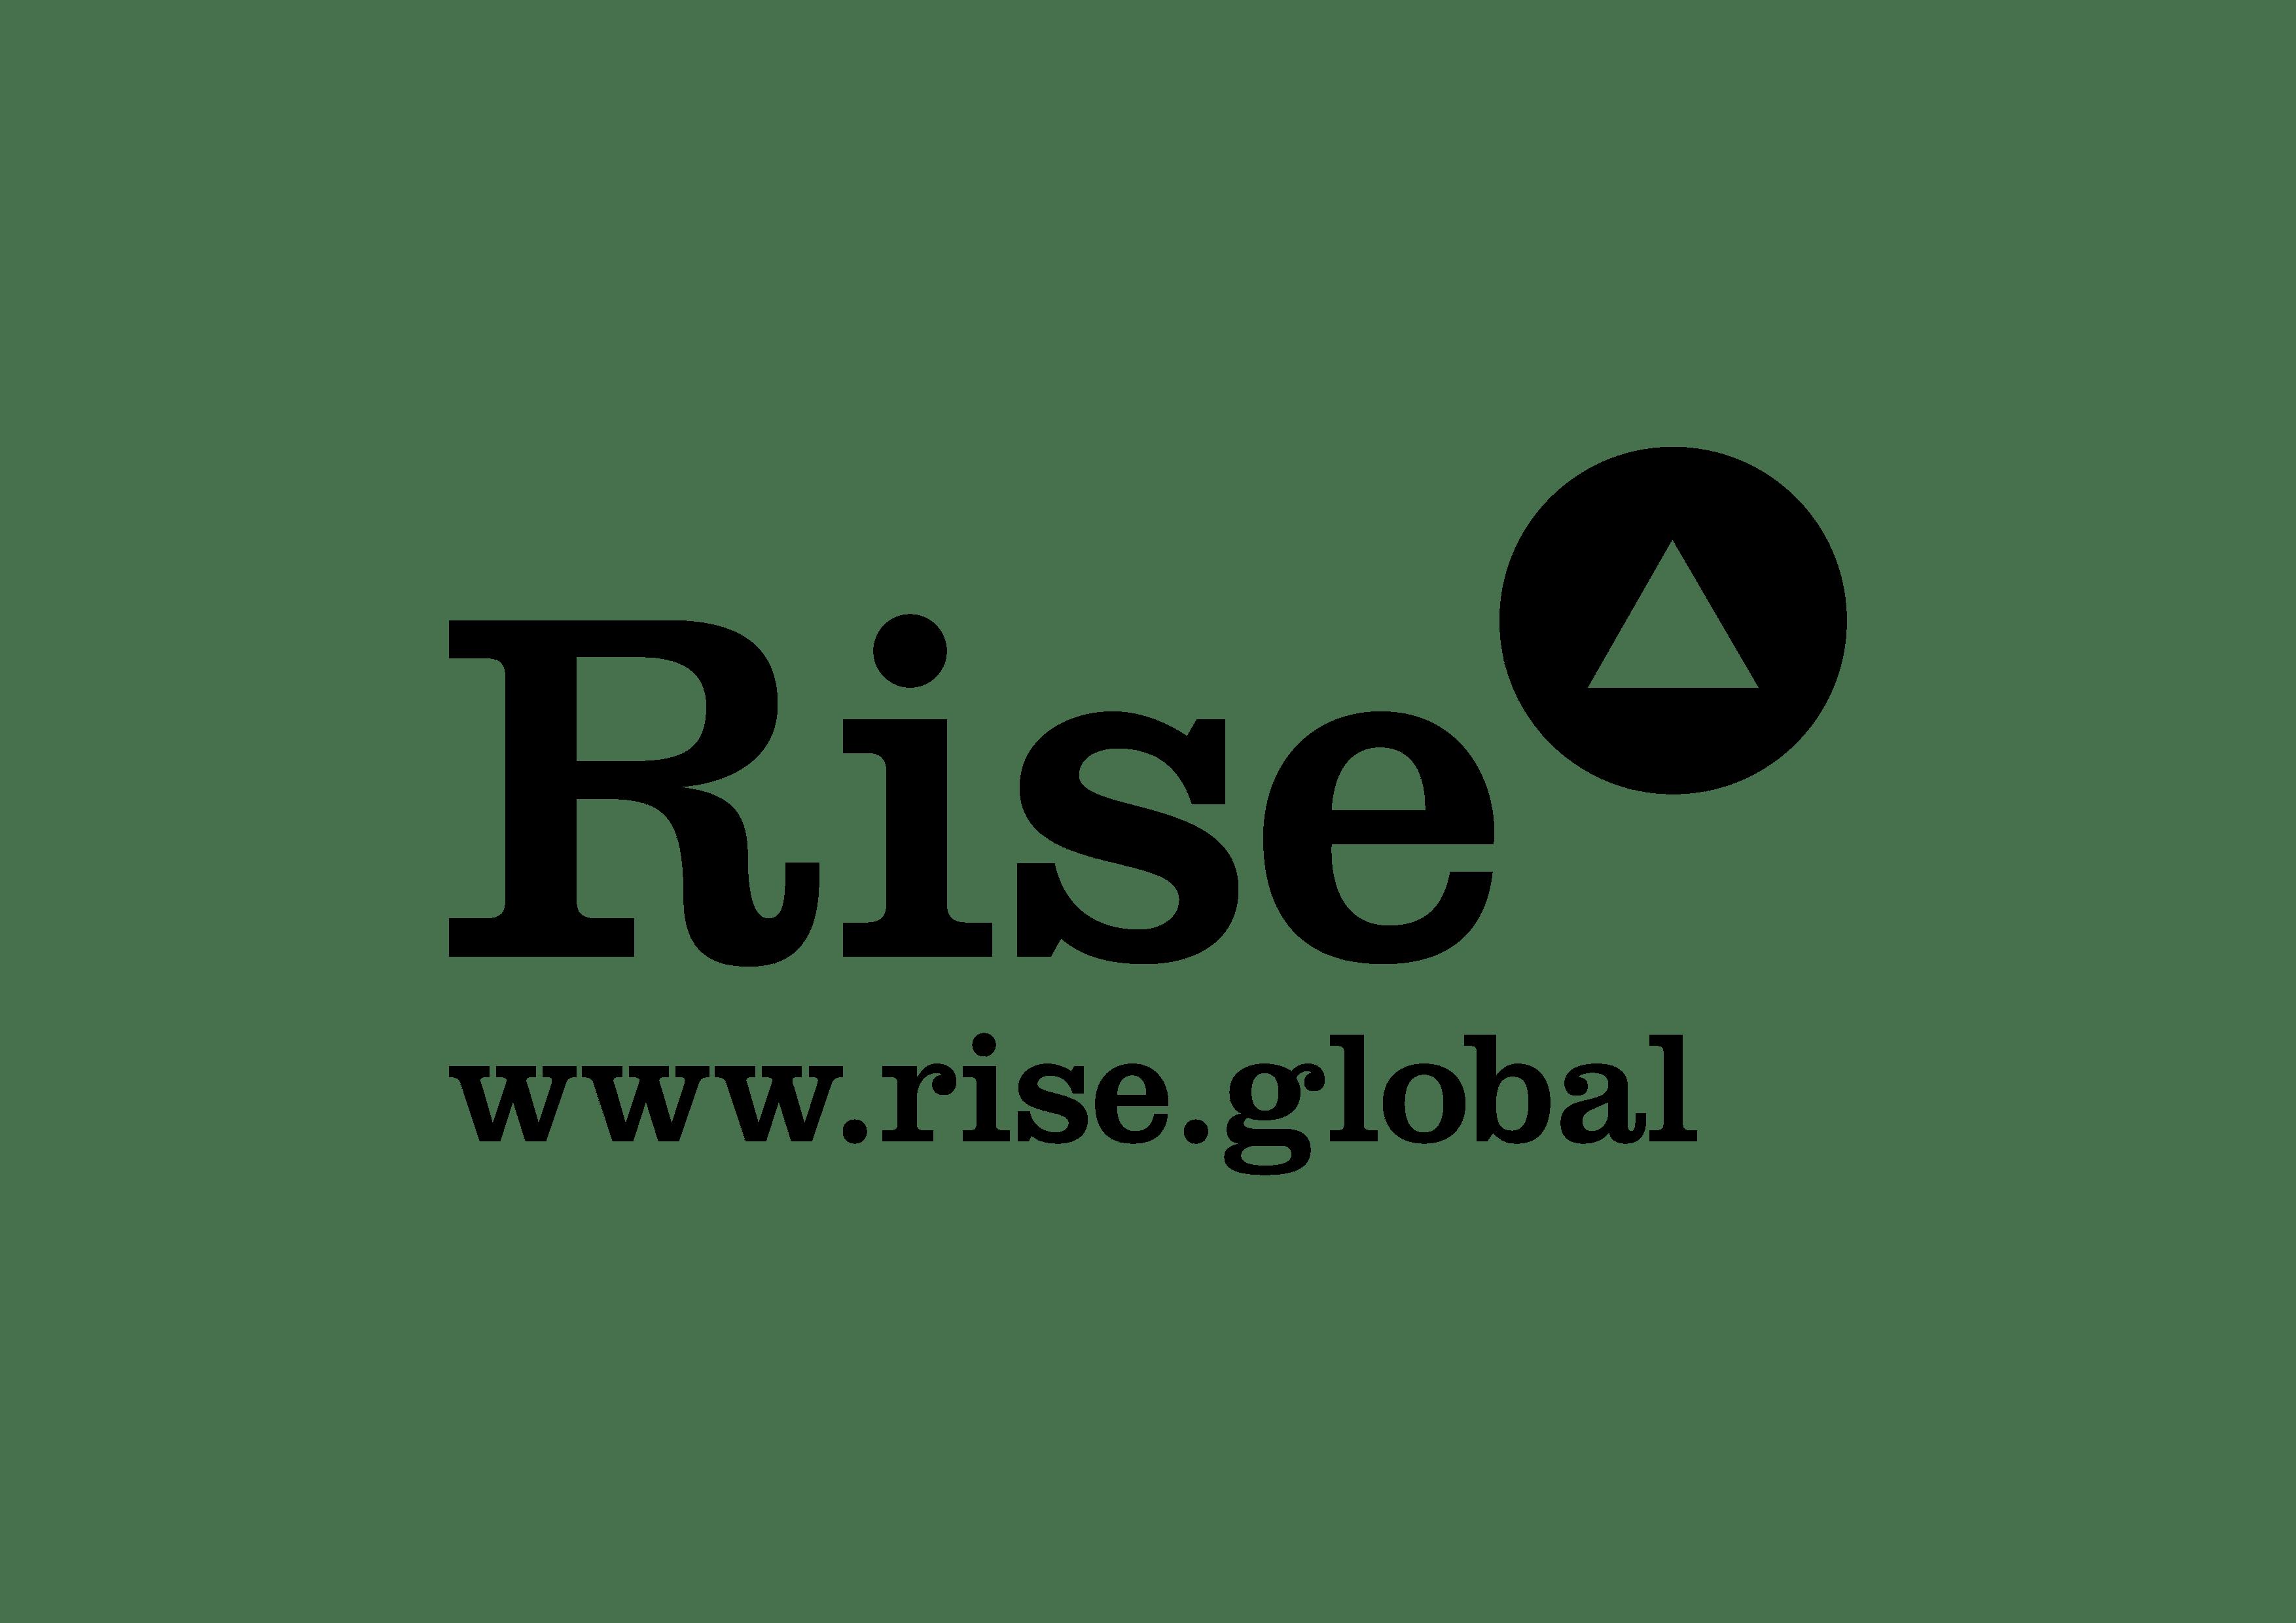 rise-logo-06